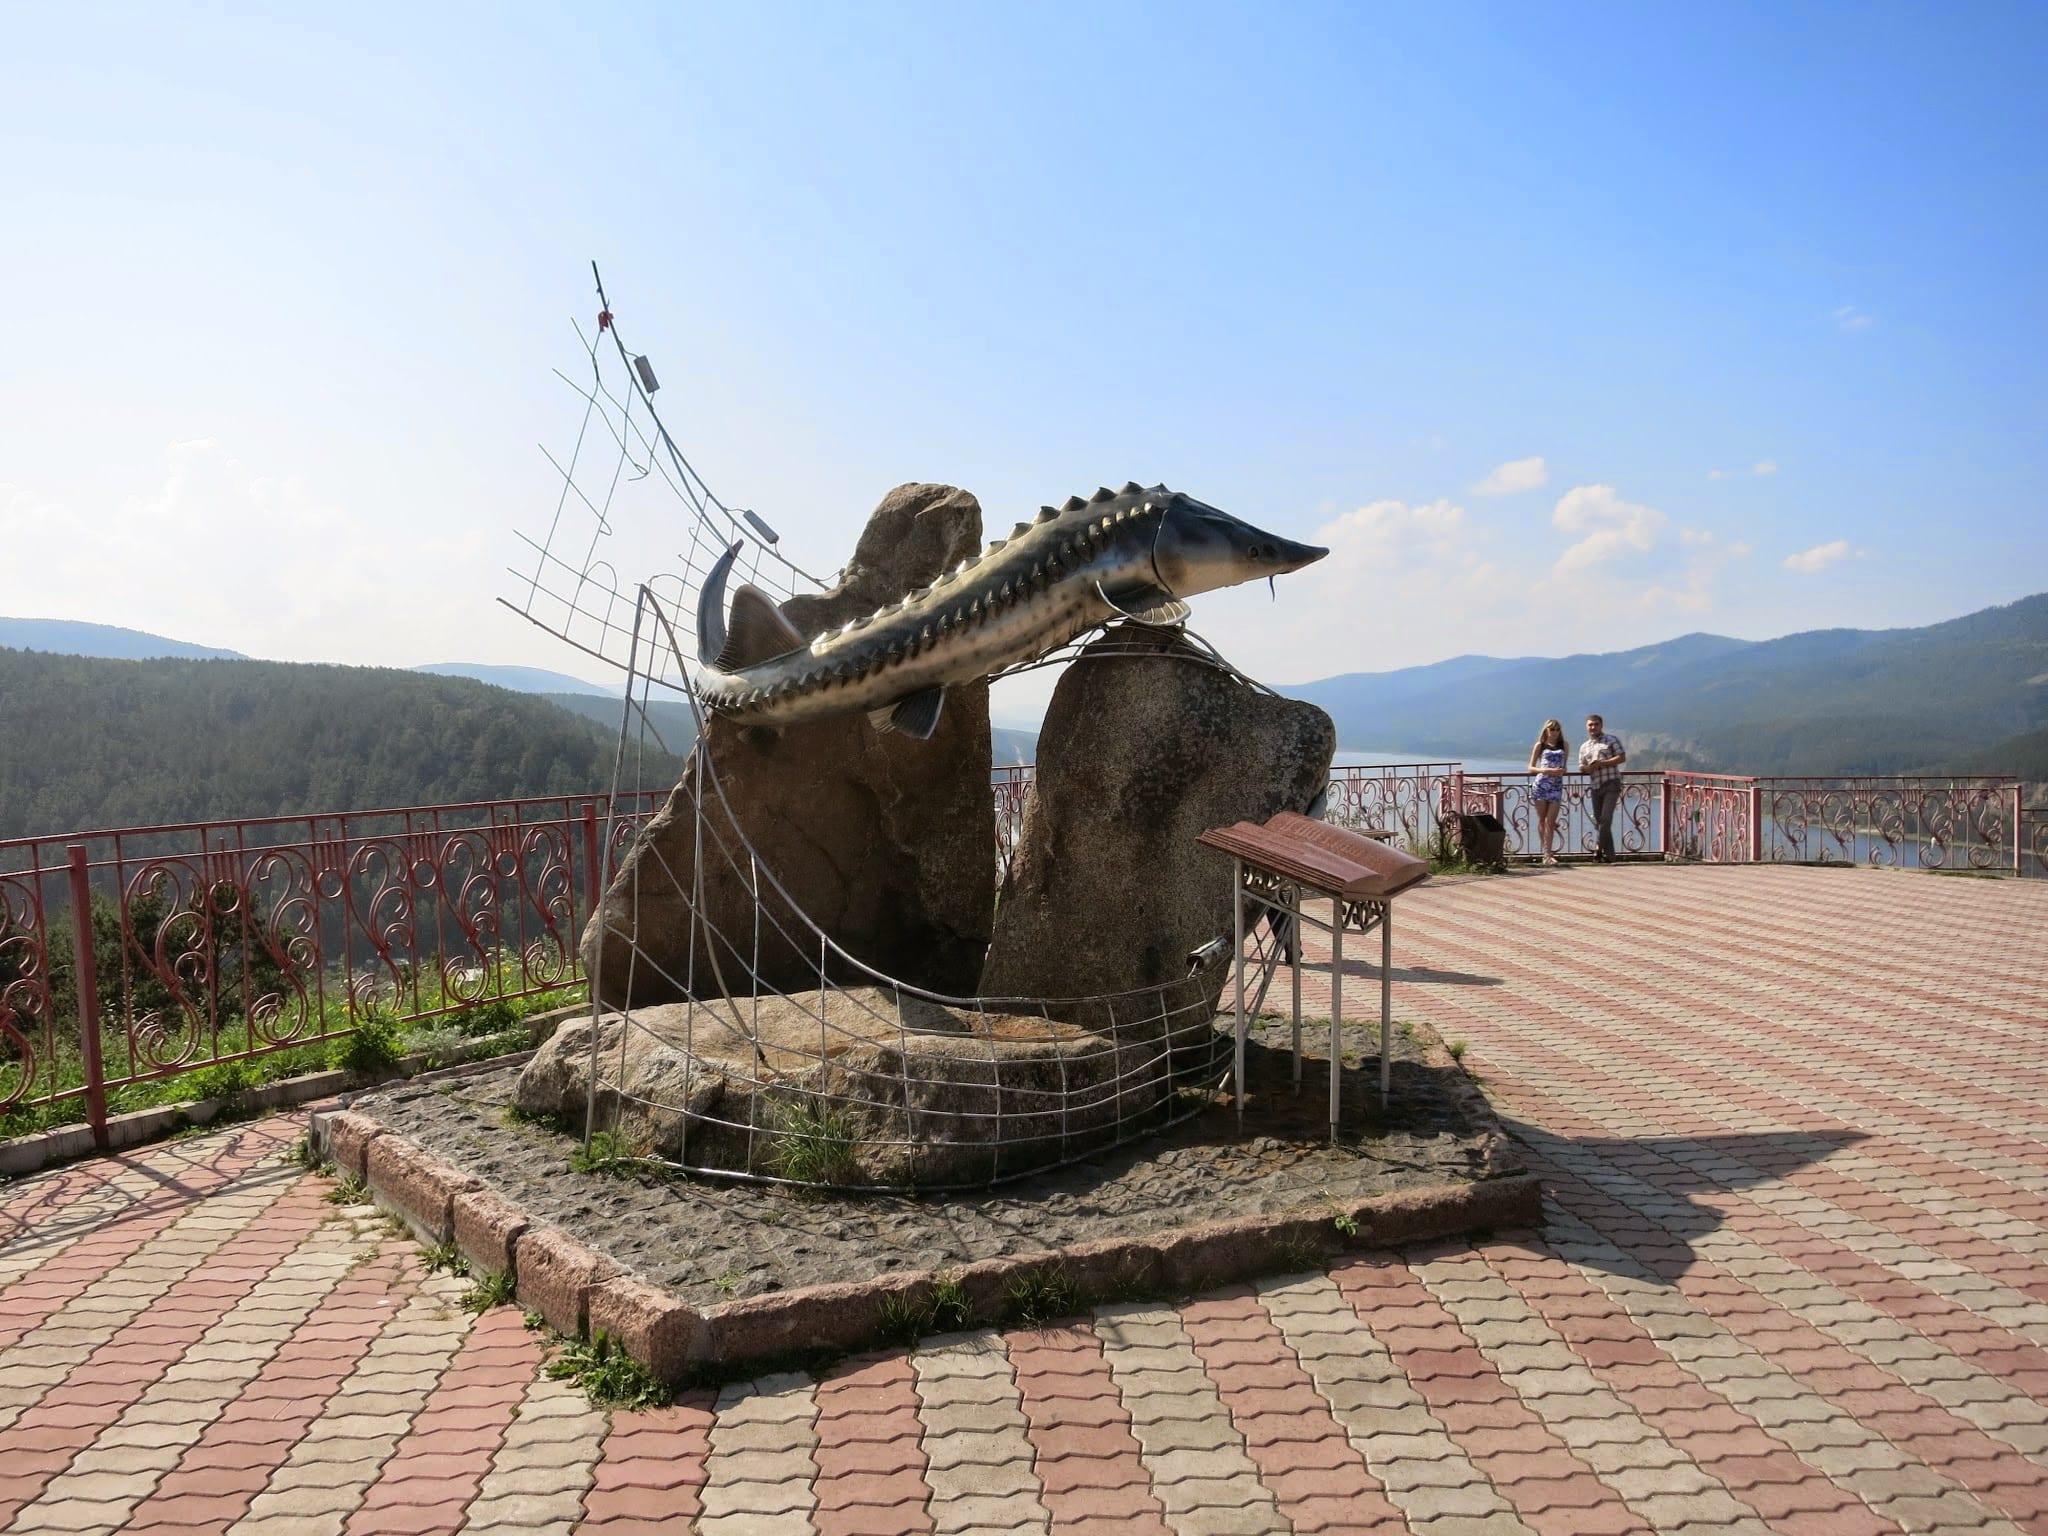 The statue of Tsar-Fish in Krasnoyarsk